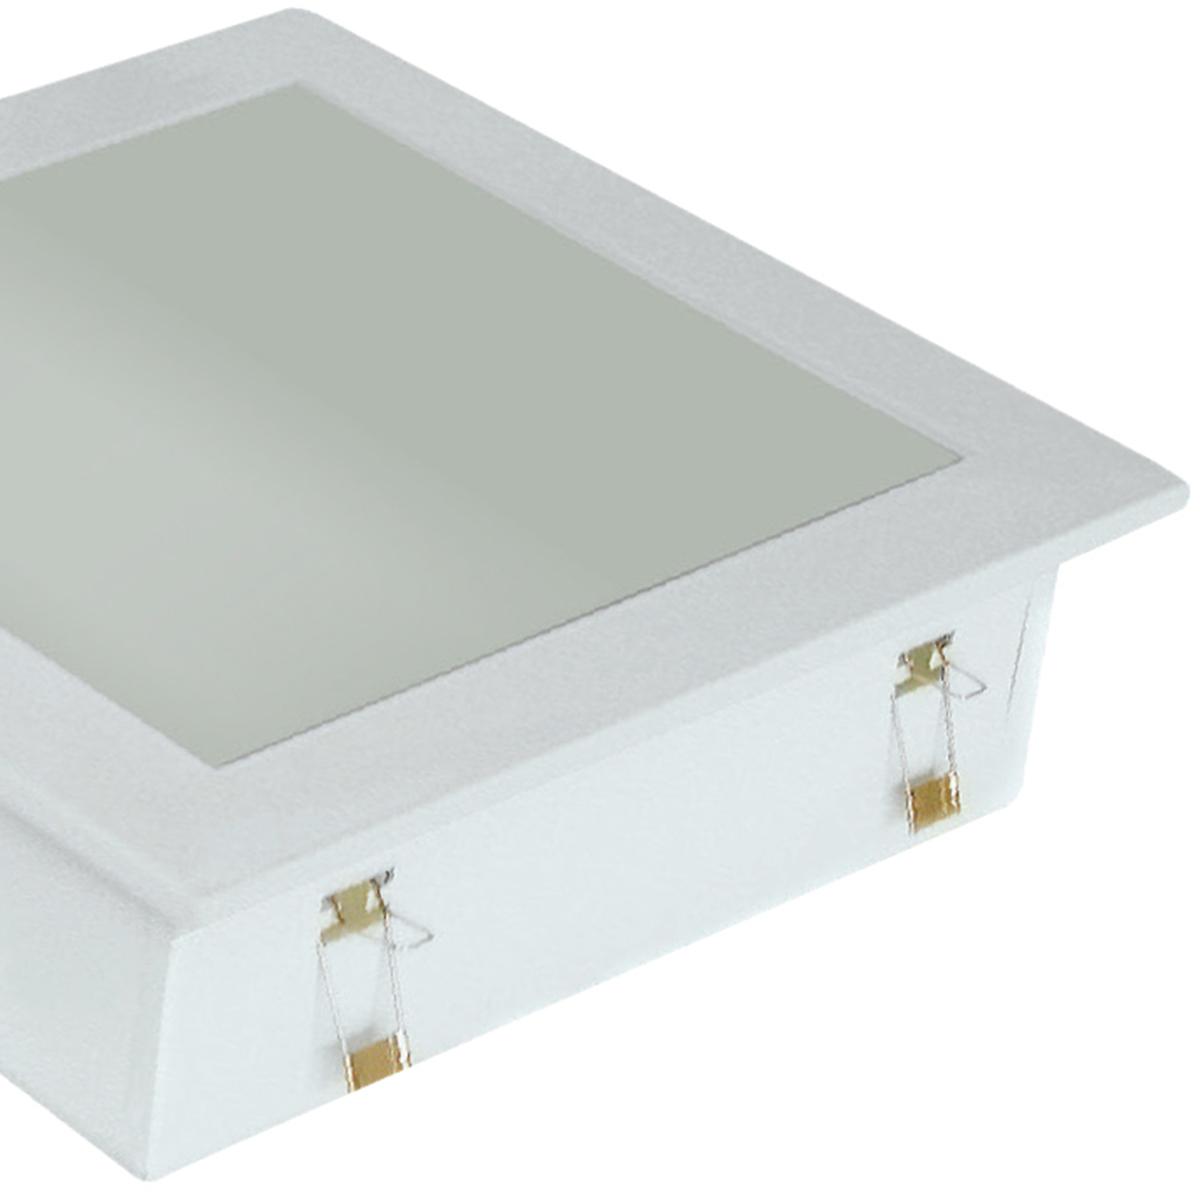 Plafon Space Emb. Quad. 25cm Alum. Vidro Fosco E-27 2 Lamp. Max 60w Branco